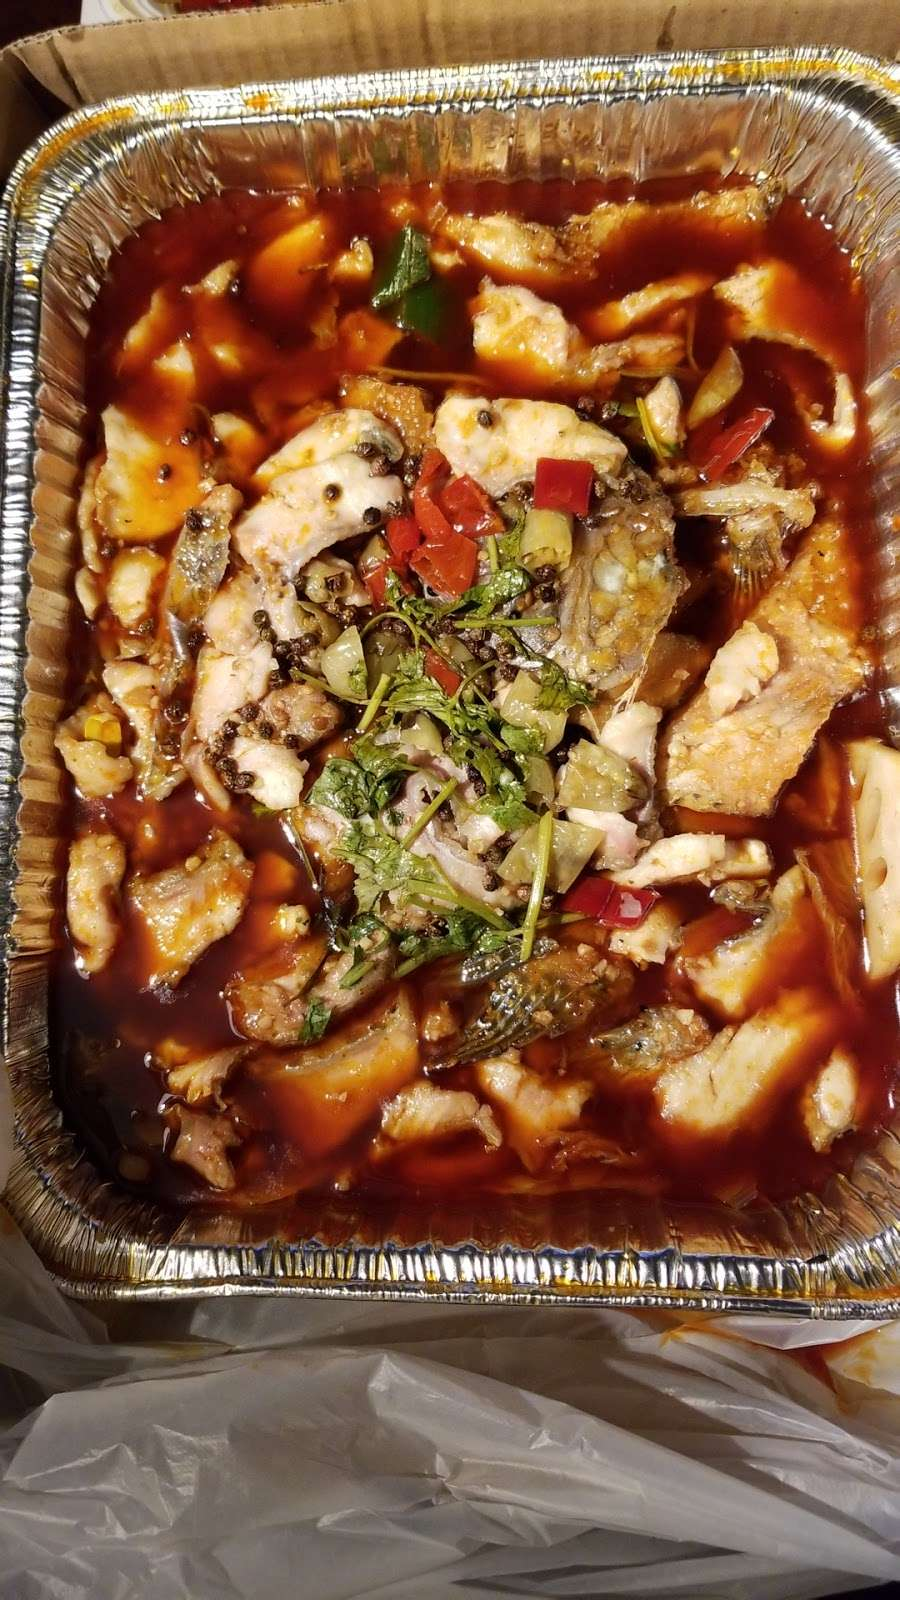 King Szechuan Palace - restaurant  | Photo 9 of 10 | Address: 83 Reservoir Ave, Jersey City, NJ 07307, USA | Phone: (201) 222-6888